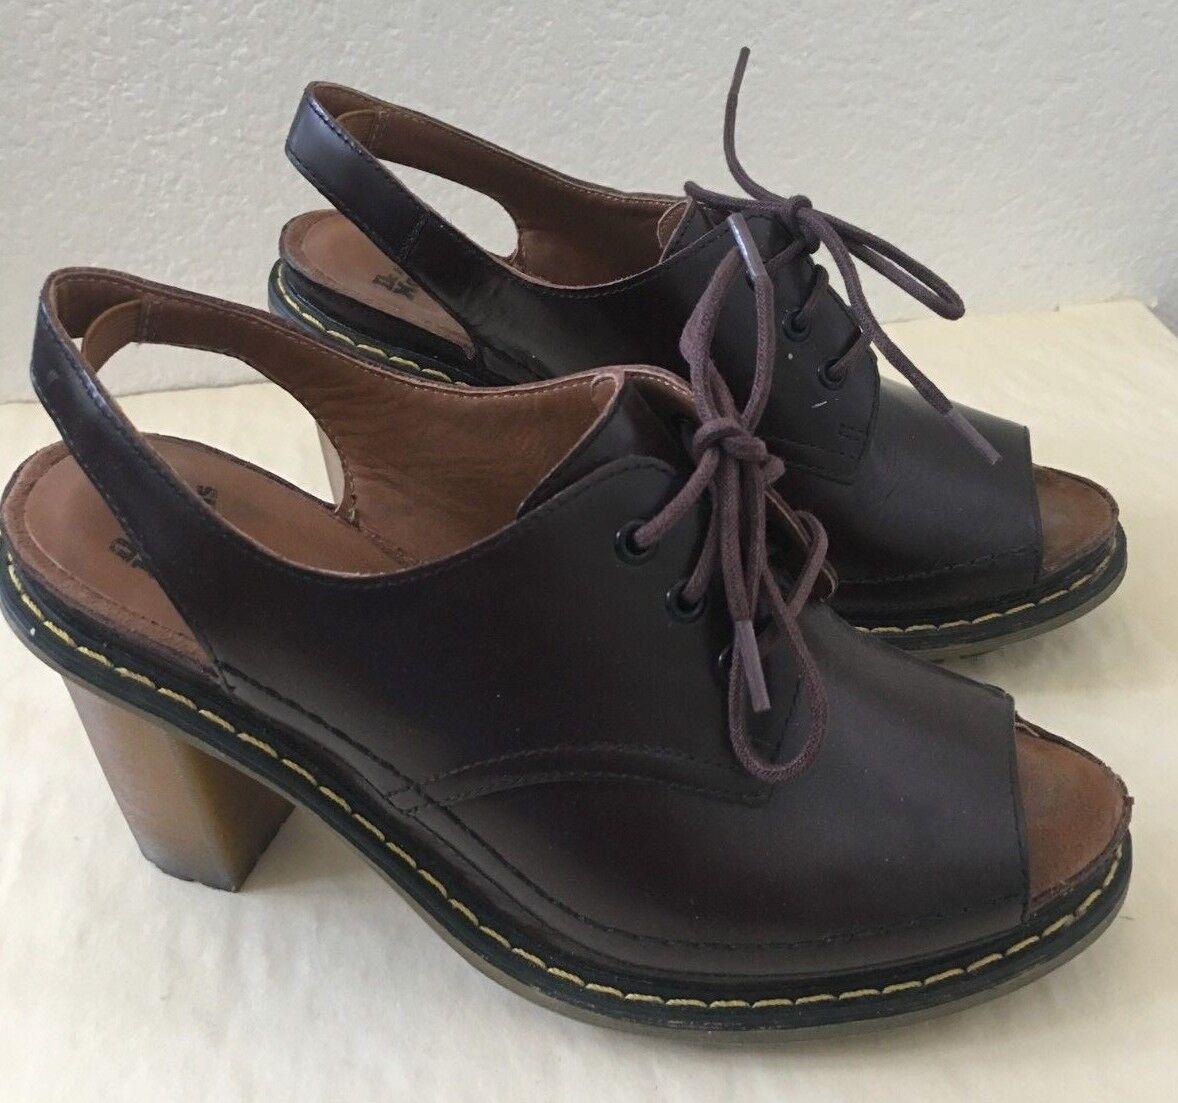 Dr. Martens Womens Tara shoes Pumps Heels Peep Toe Size 6 Chocolate Brown